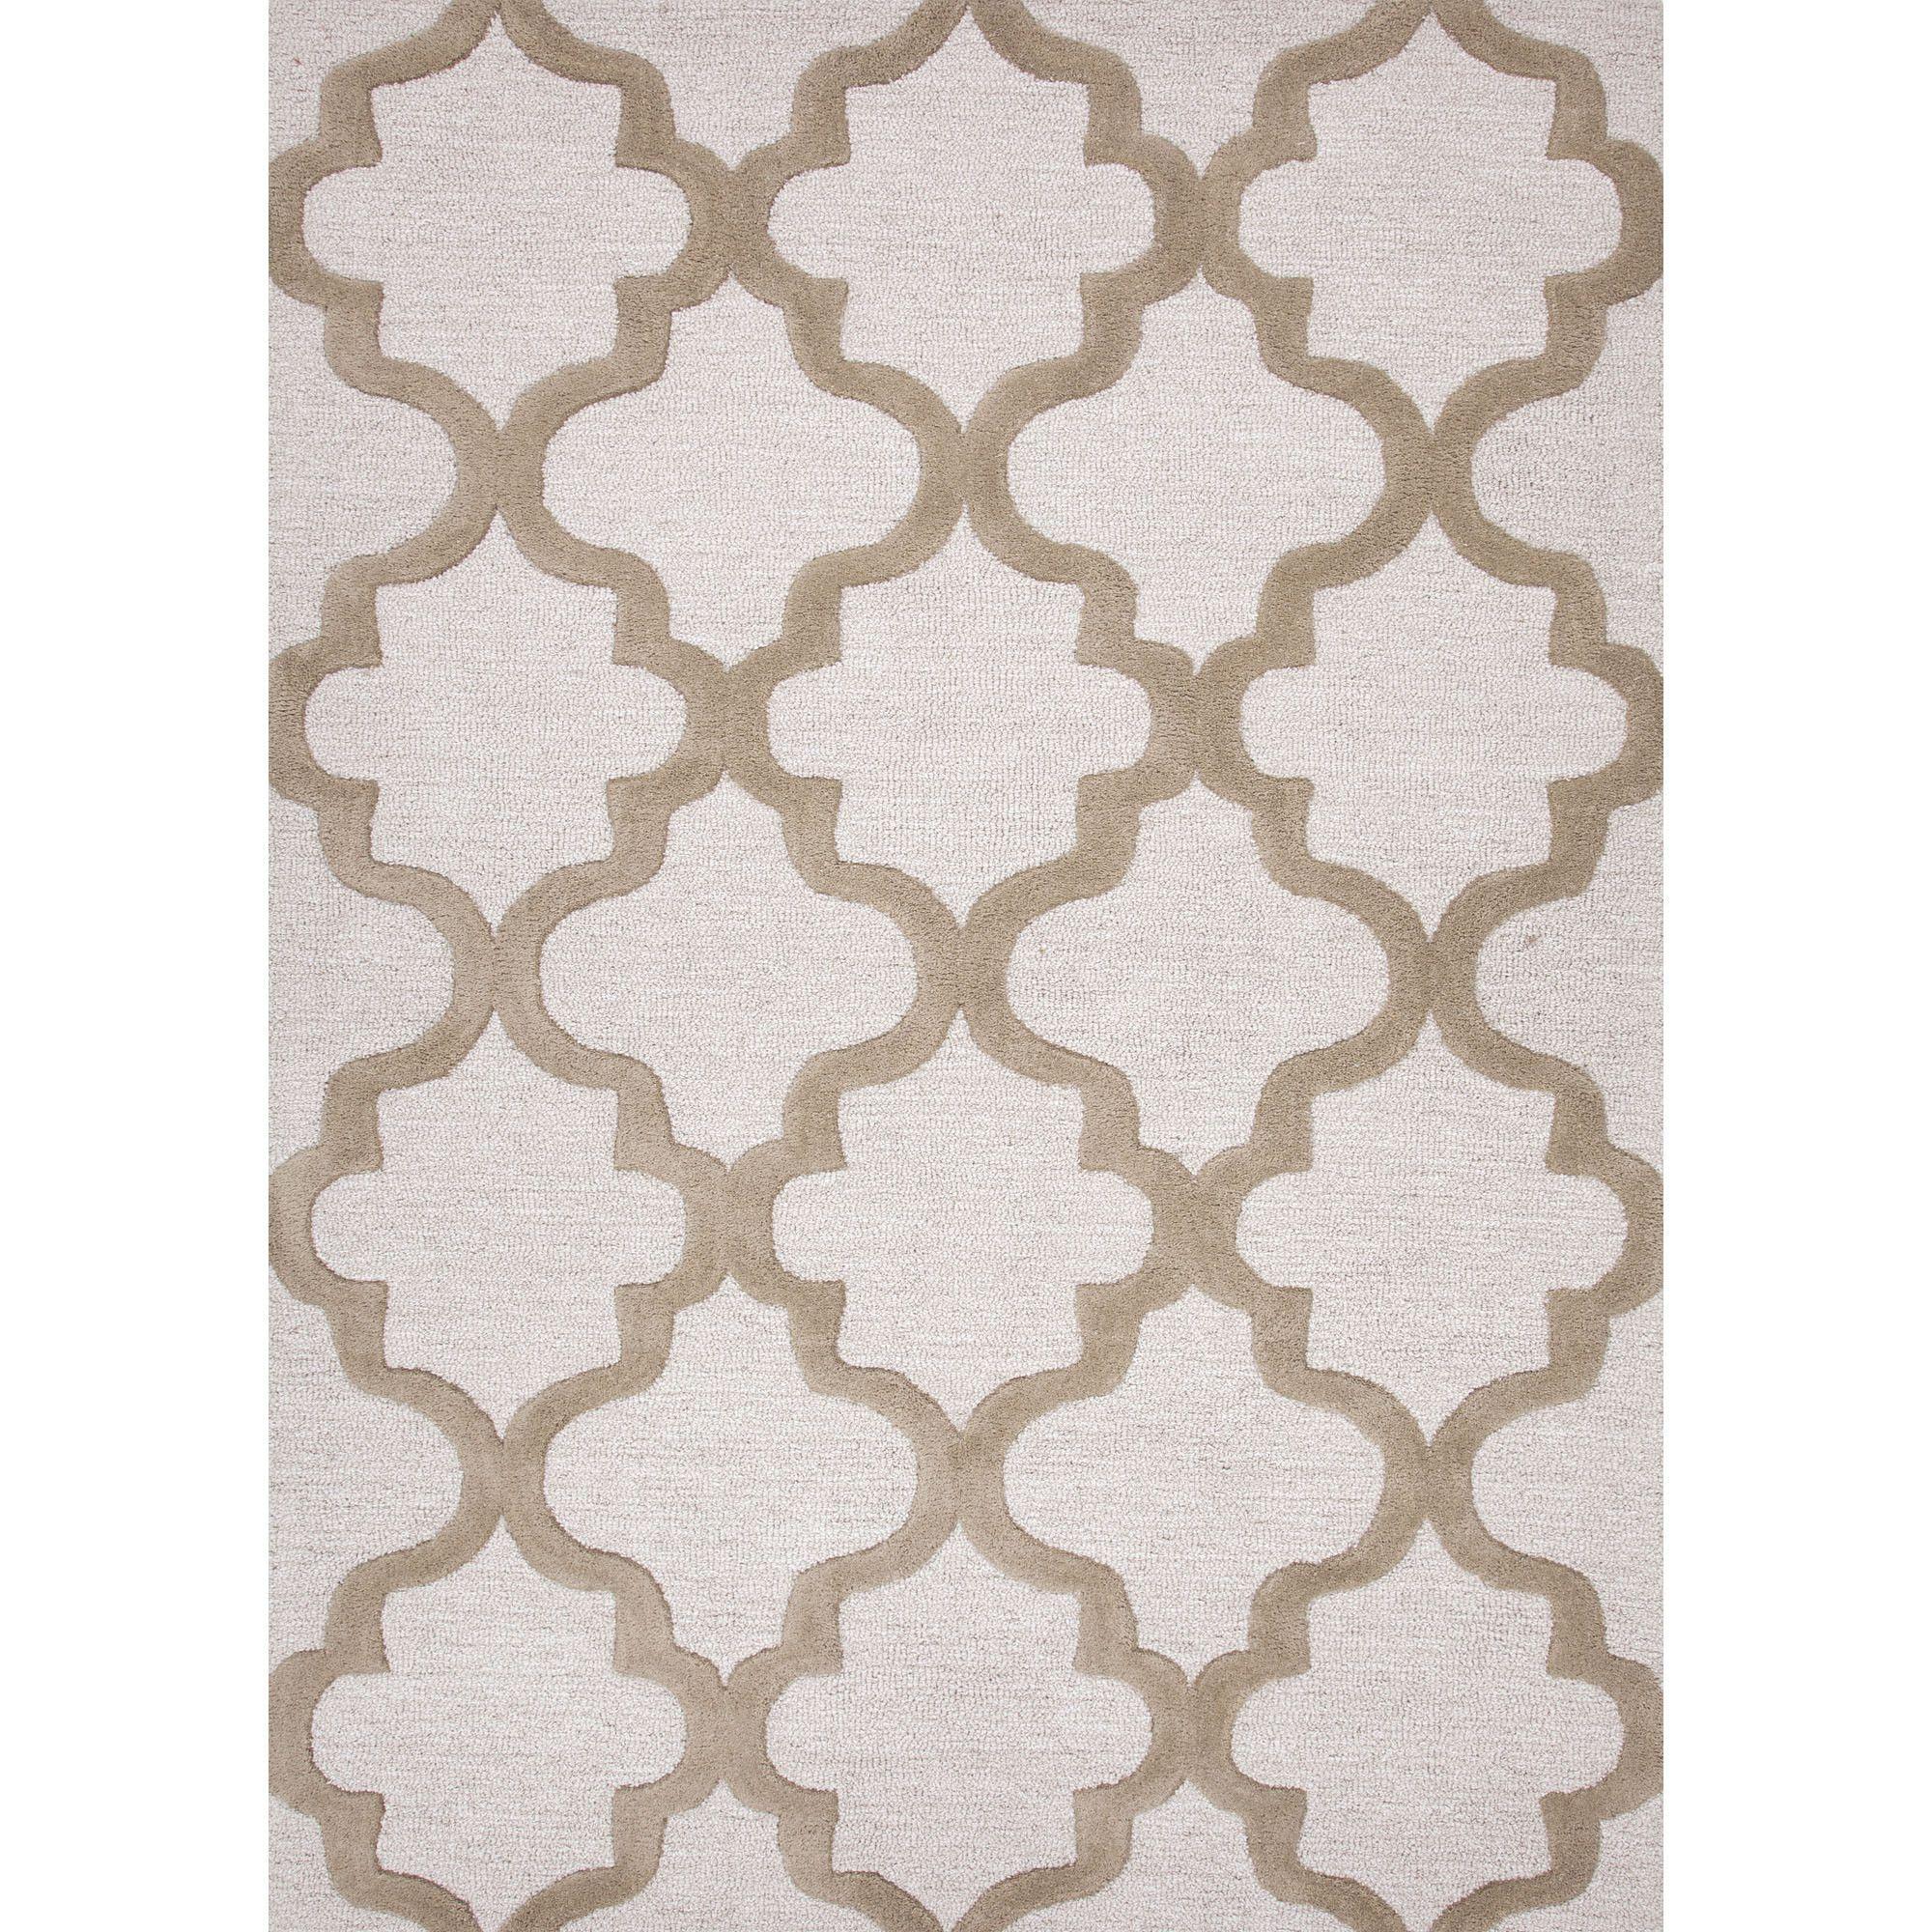 Jaipur Rugs Modern Geometric Pattern Ivory Taupe Wool Area